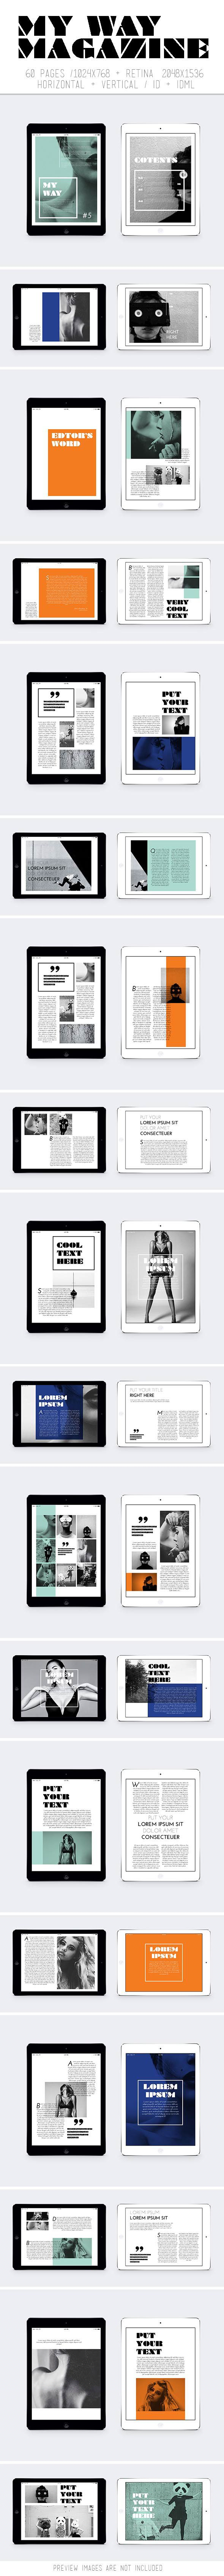 Tablet My Way Magazine on Behance